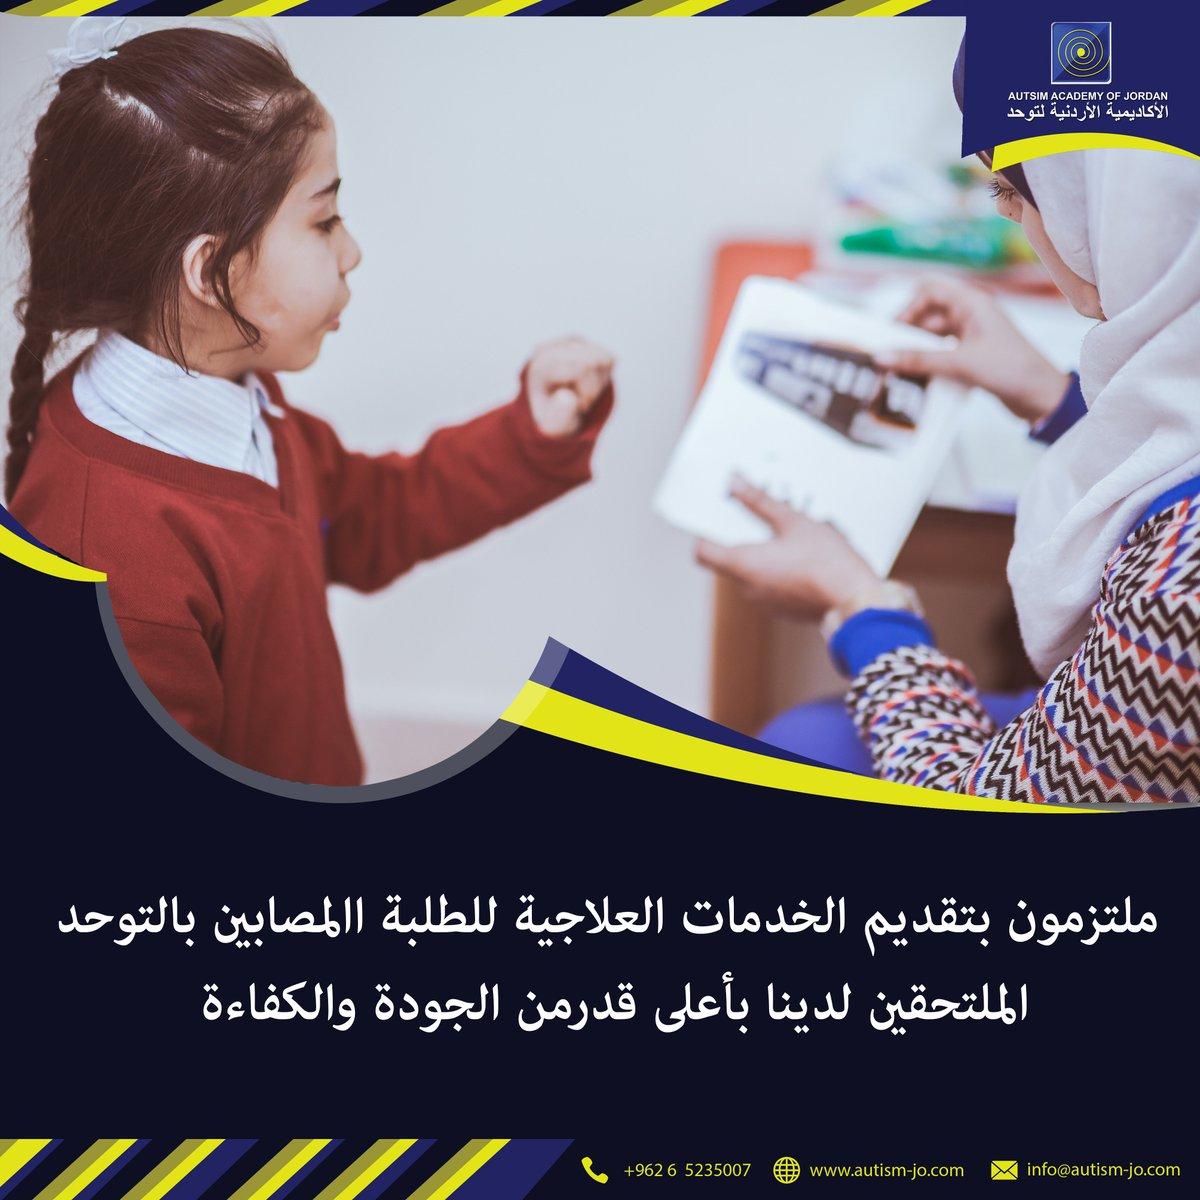 #Autism_academy_of_jordan #الأكاديمية_الأردنية_للتوحد #أطفال #التوحد #AAJ #Autism #amman #Jordan  #توحد